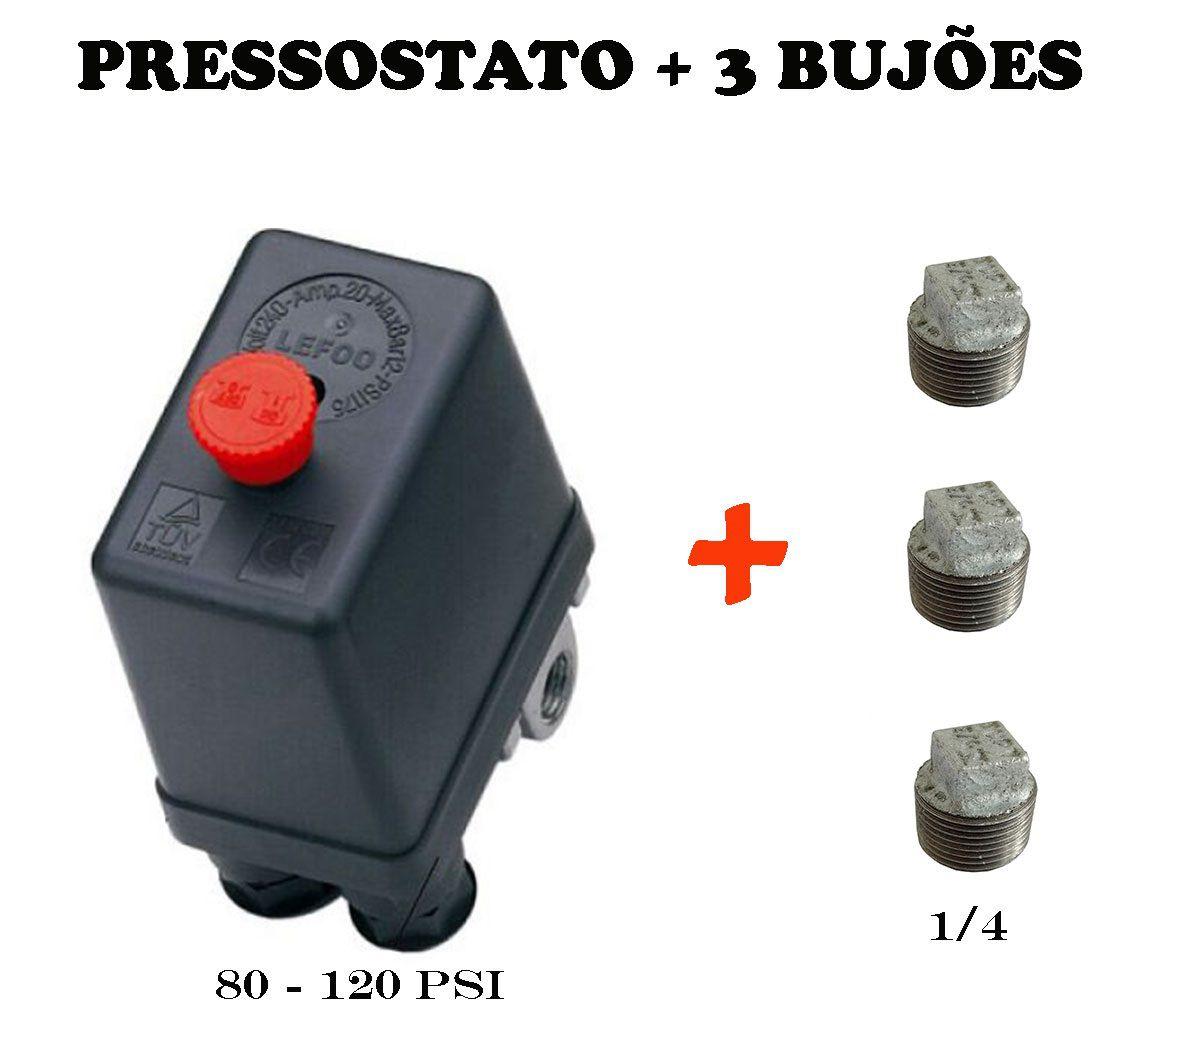 Pressostato Compressor Automático 4vias 80-120 + 3 Bujão 1/4